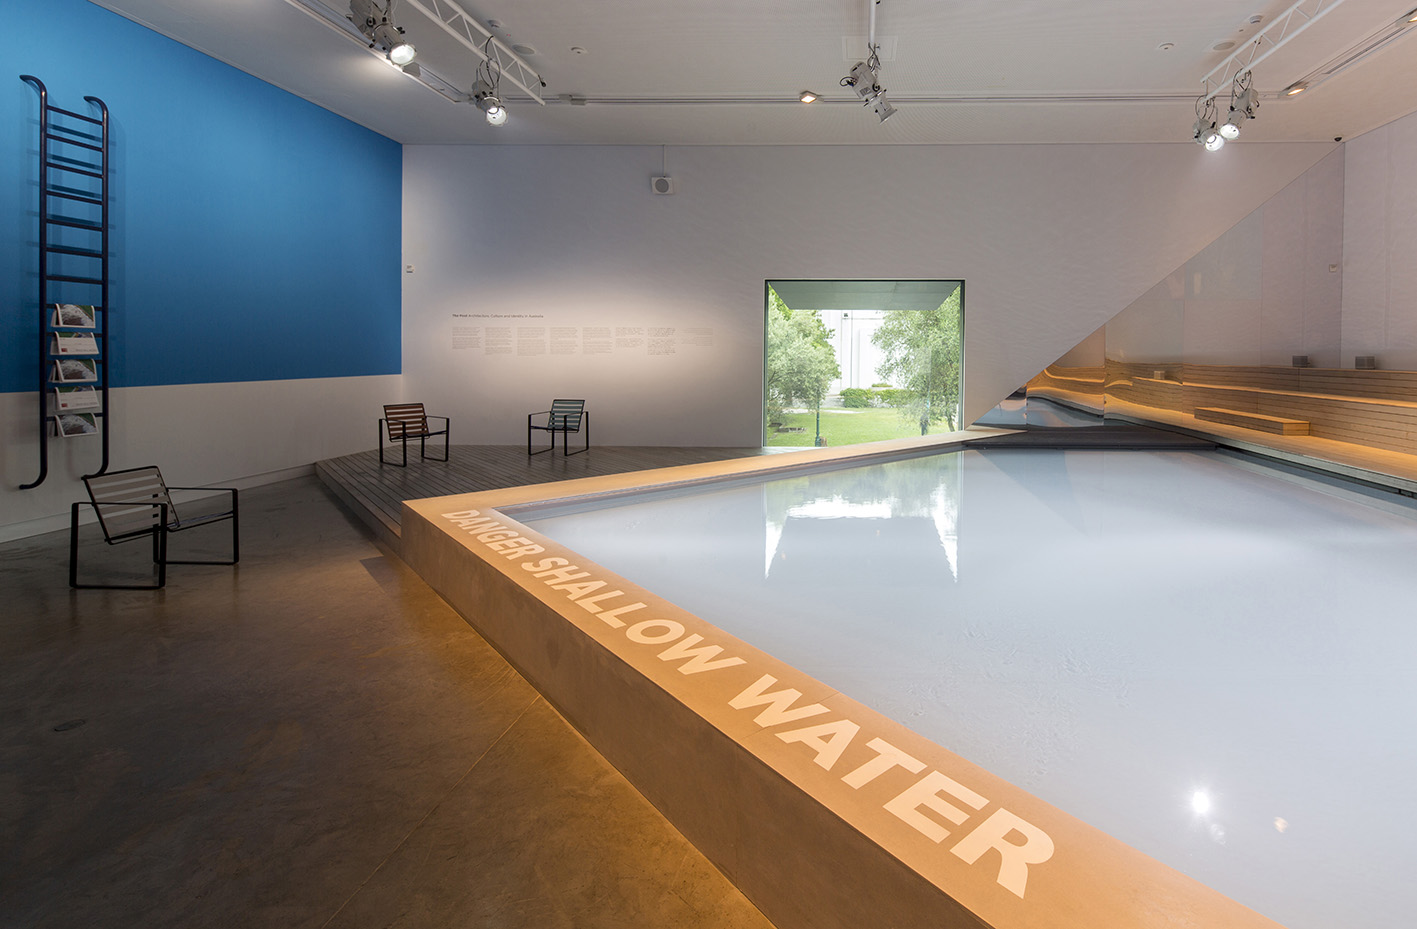 The Pool, Padiglione Australia, Biennale di Architettura di Venezia, 2016.